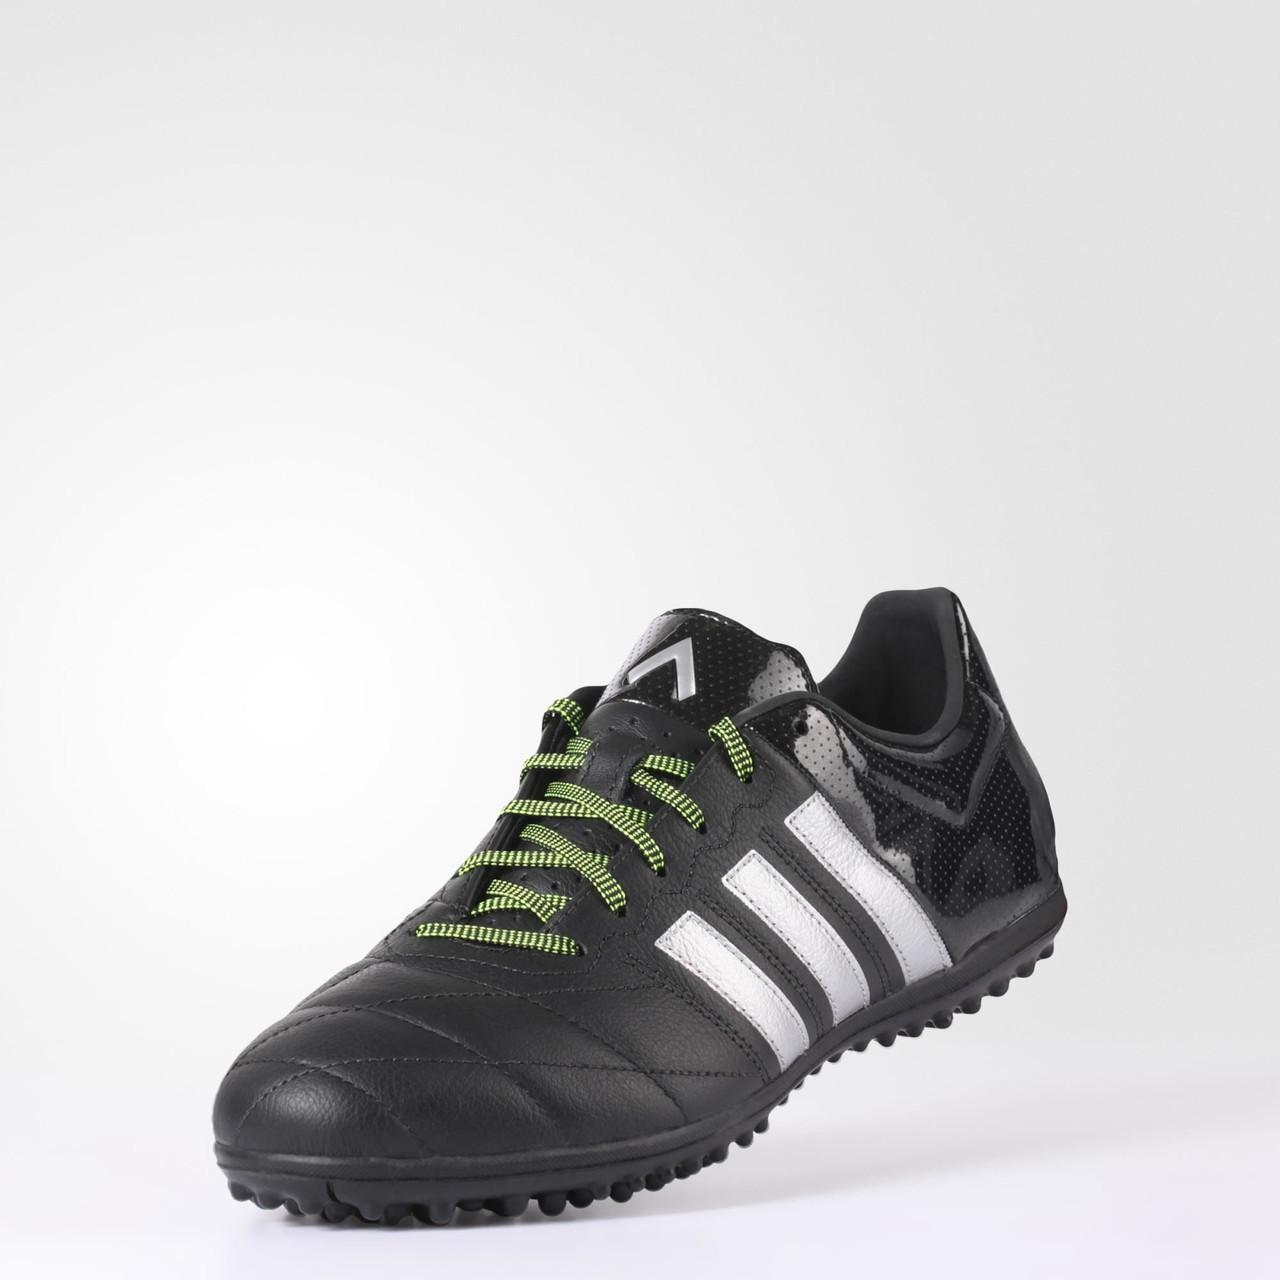 on sale 49858 7f5c1 Обувь для футбола (сороканожки) Adidas ACE 15.3 TF Leather